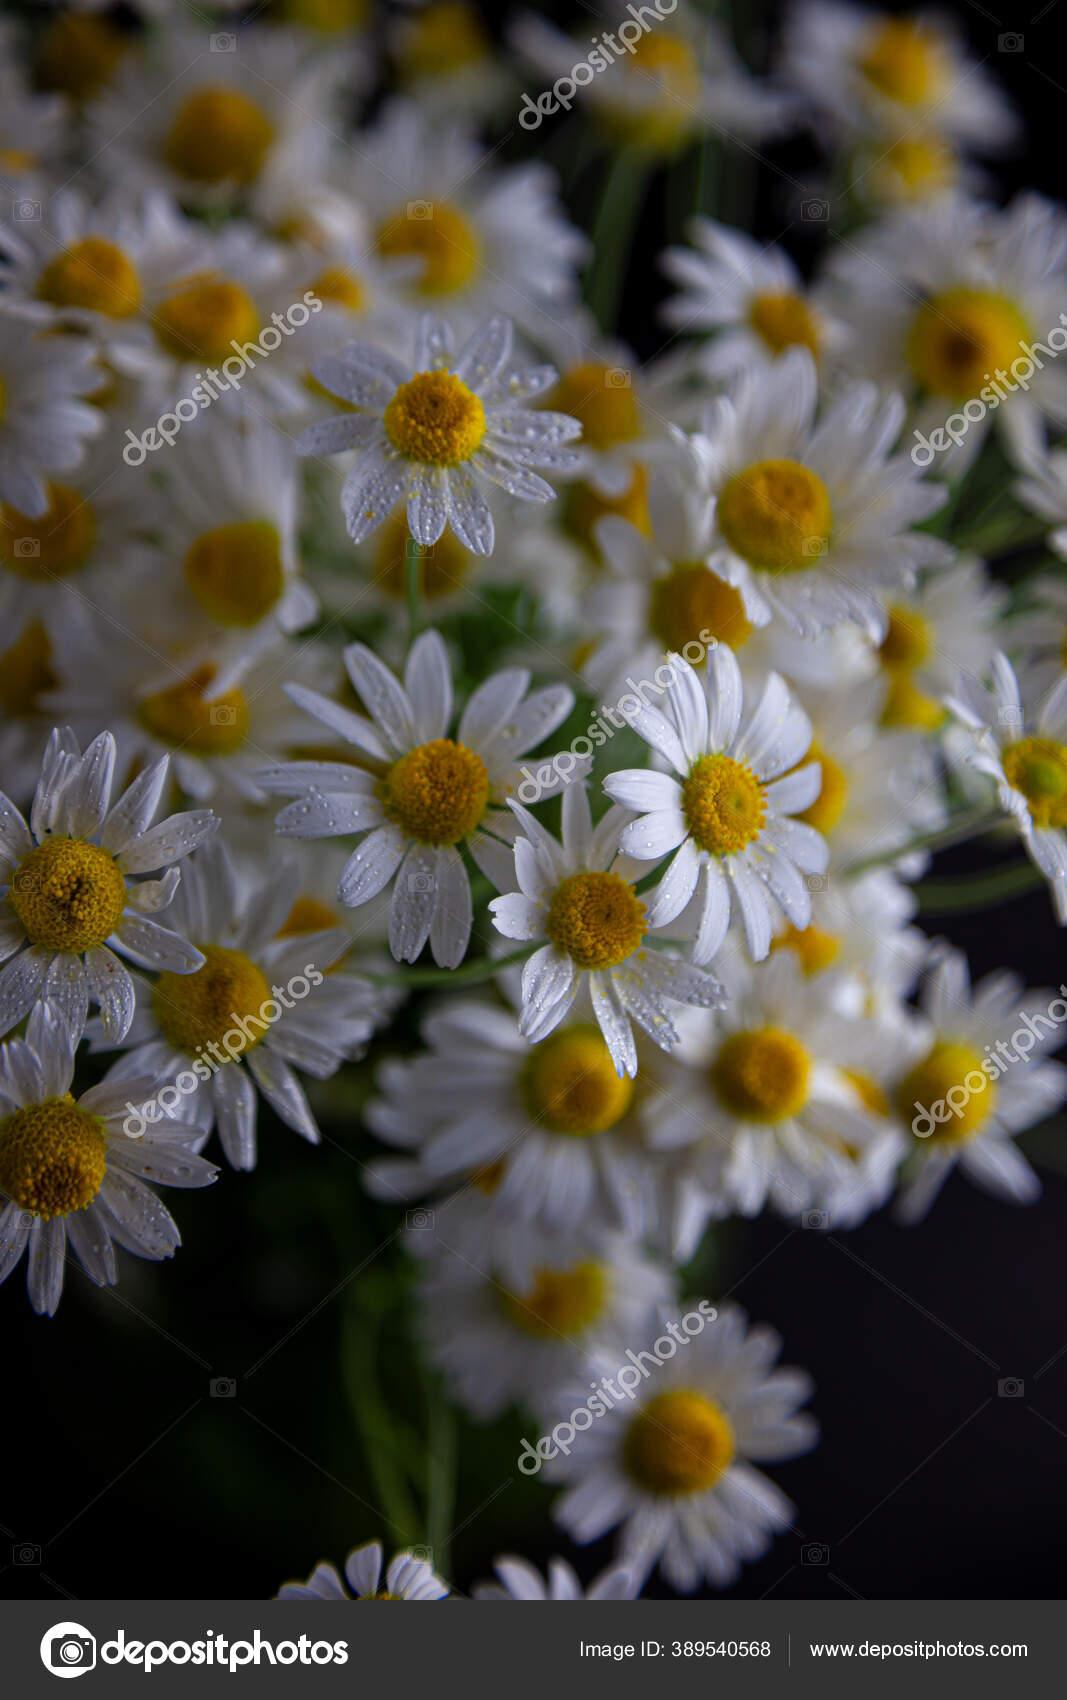 Bouquet Bunga Aster Dalam Vas Pada Latar Belakang Hitam Bidang Stok Foto C Alla Greeg Ukr Net 389540568